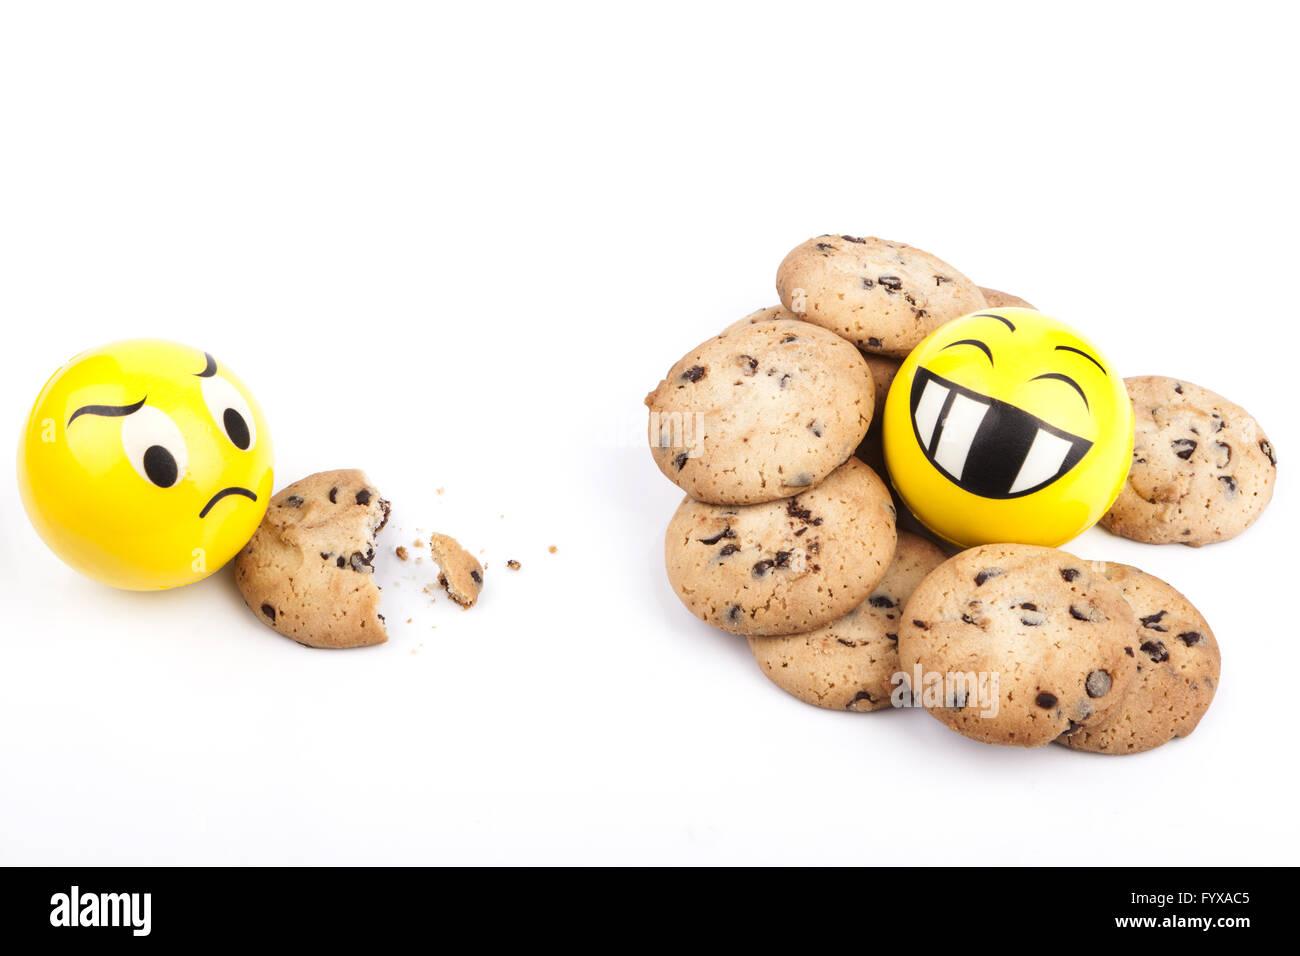 Lots of Cookies - Stock Image